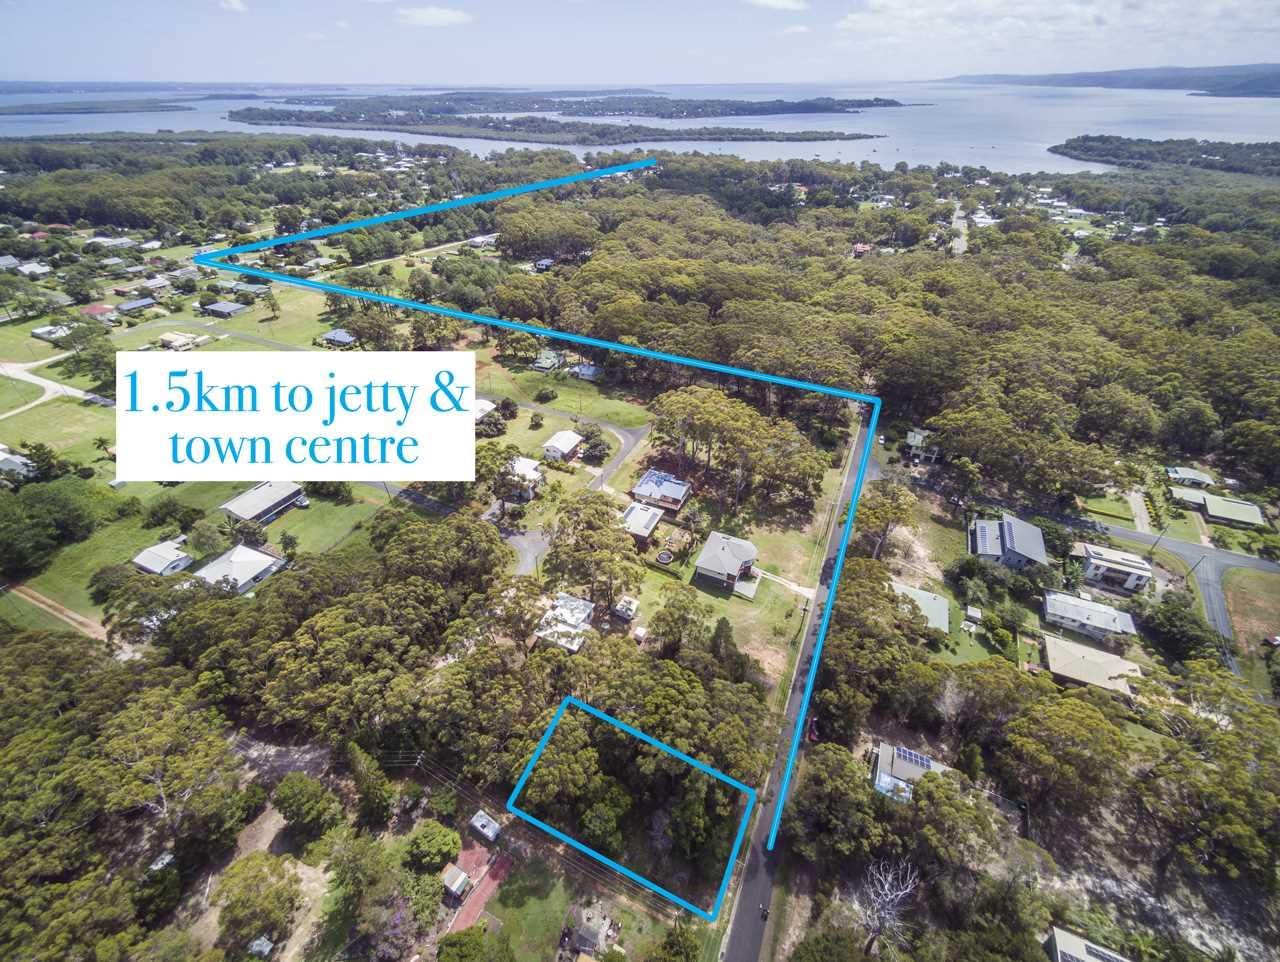 Drone view 1.5 km to jetty